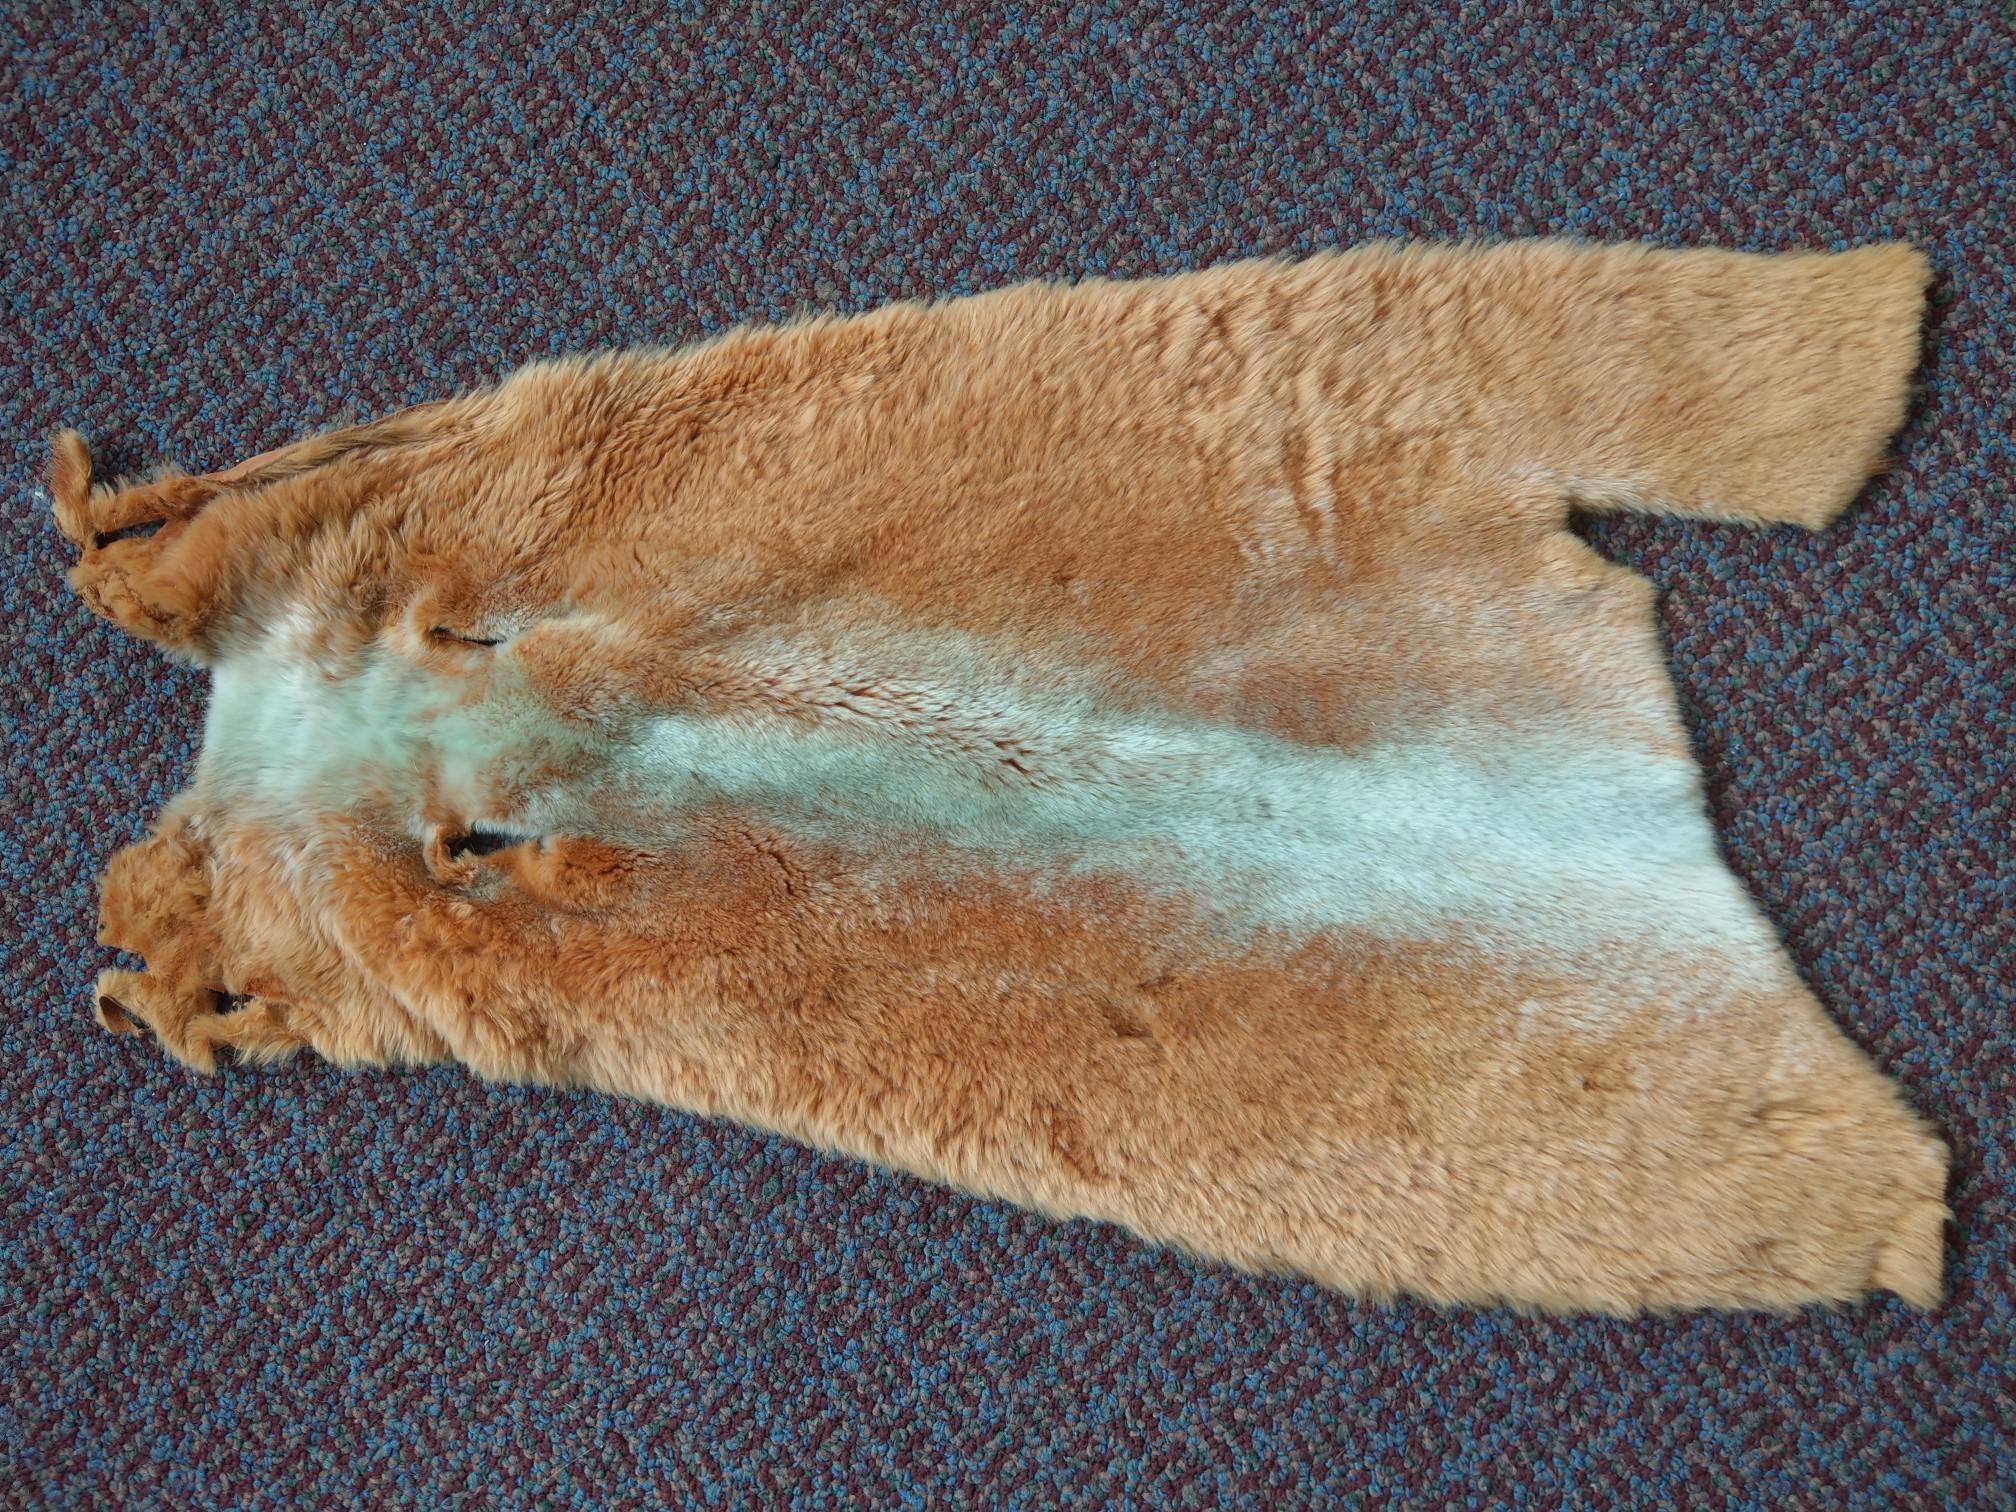 "Dyed Nutria Pelt Soft Tanned Nutria Pelt Skin Size: 20"" X 10"""